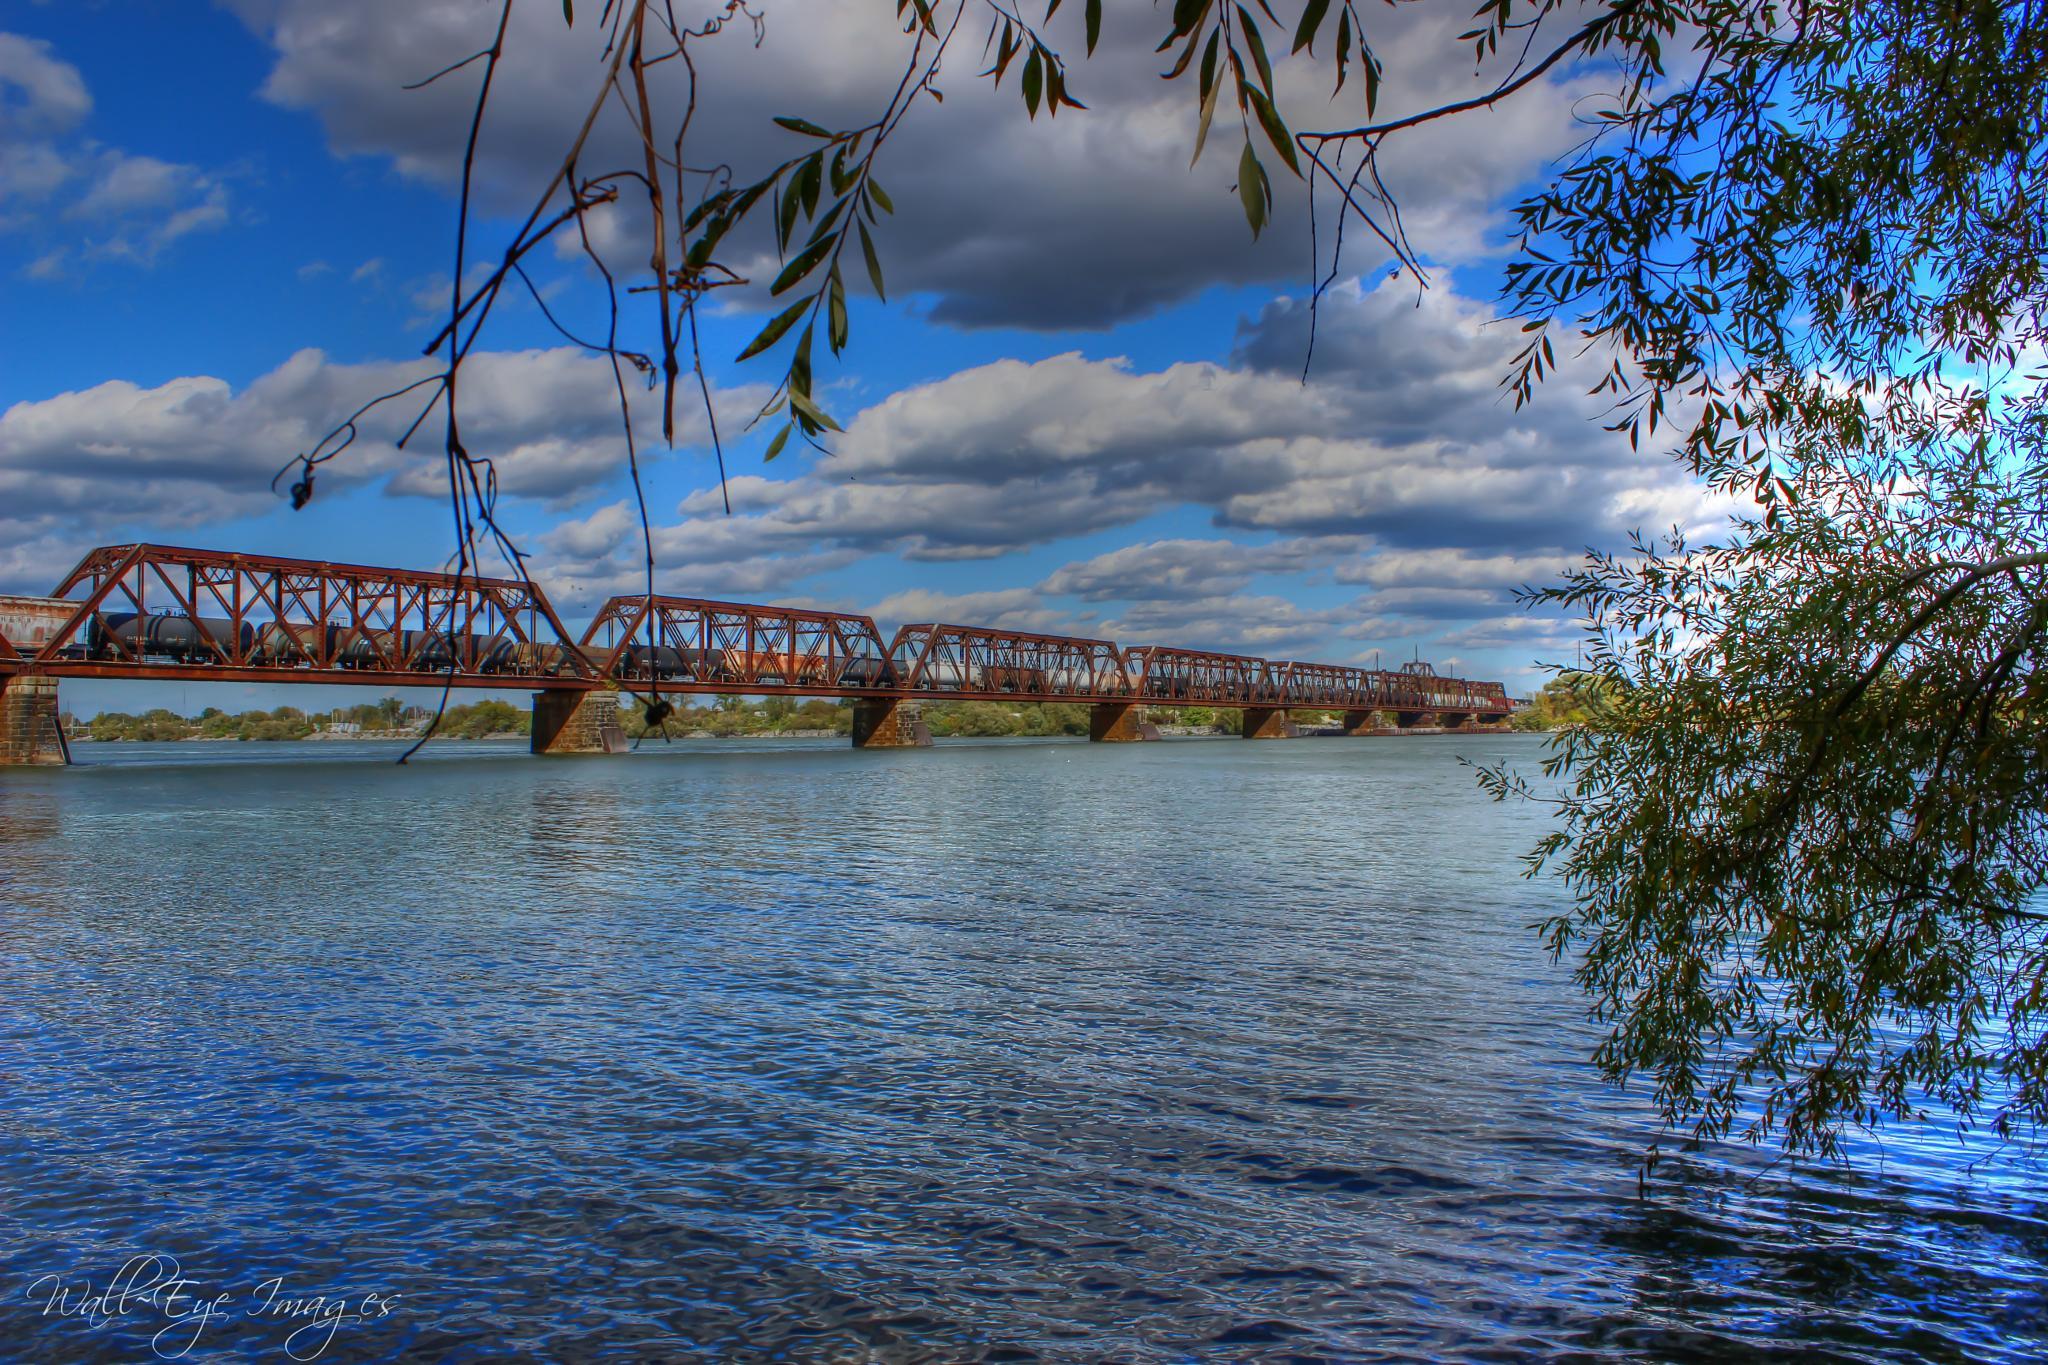 International Train Bridge by WallEye